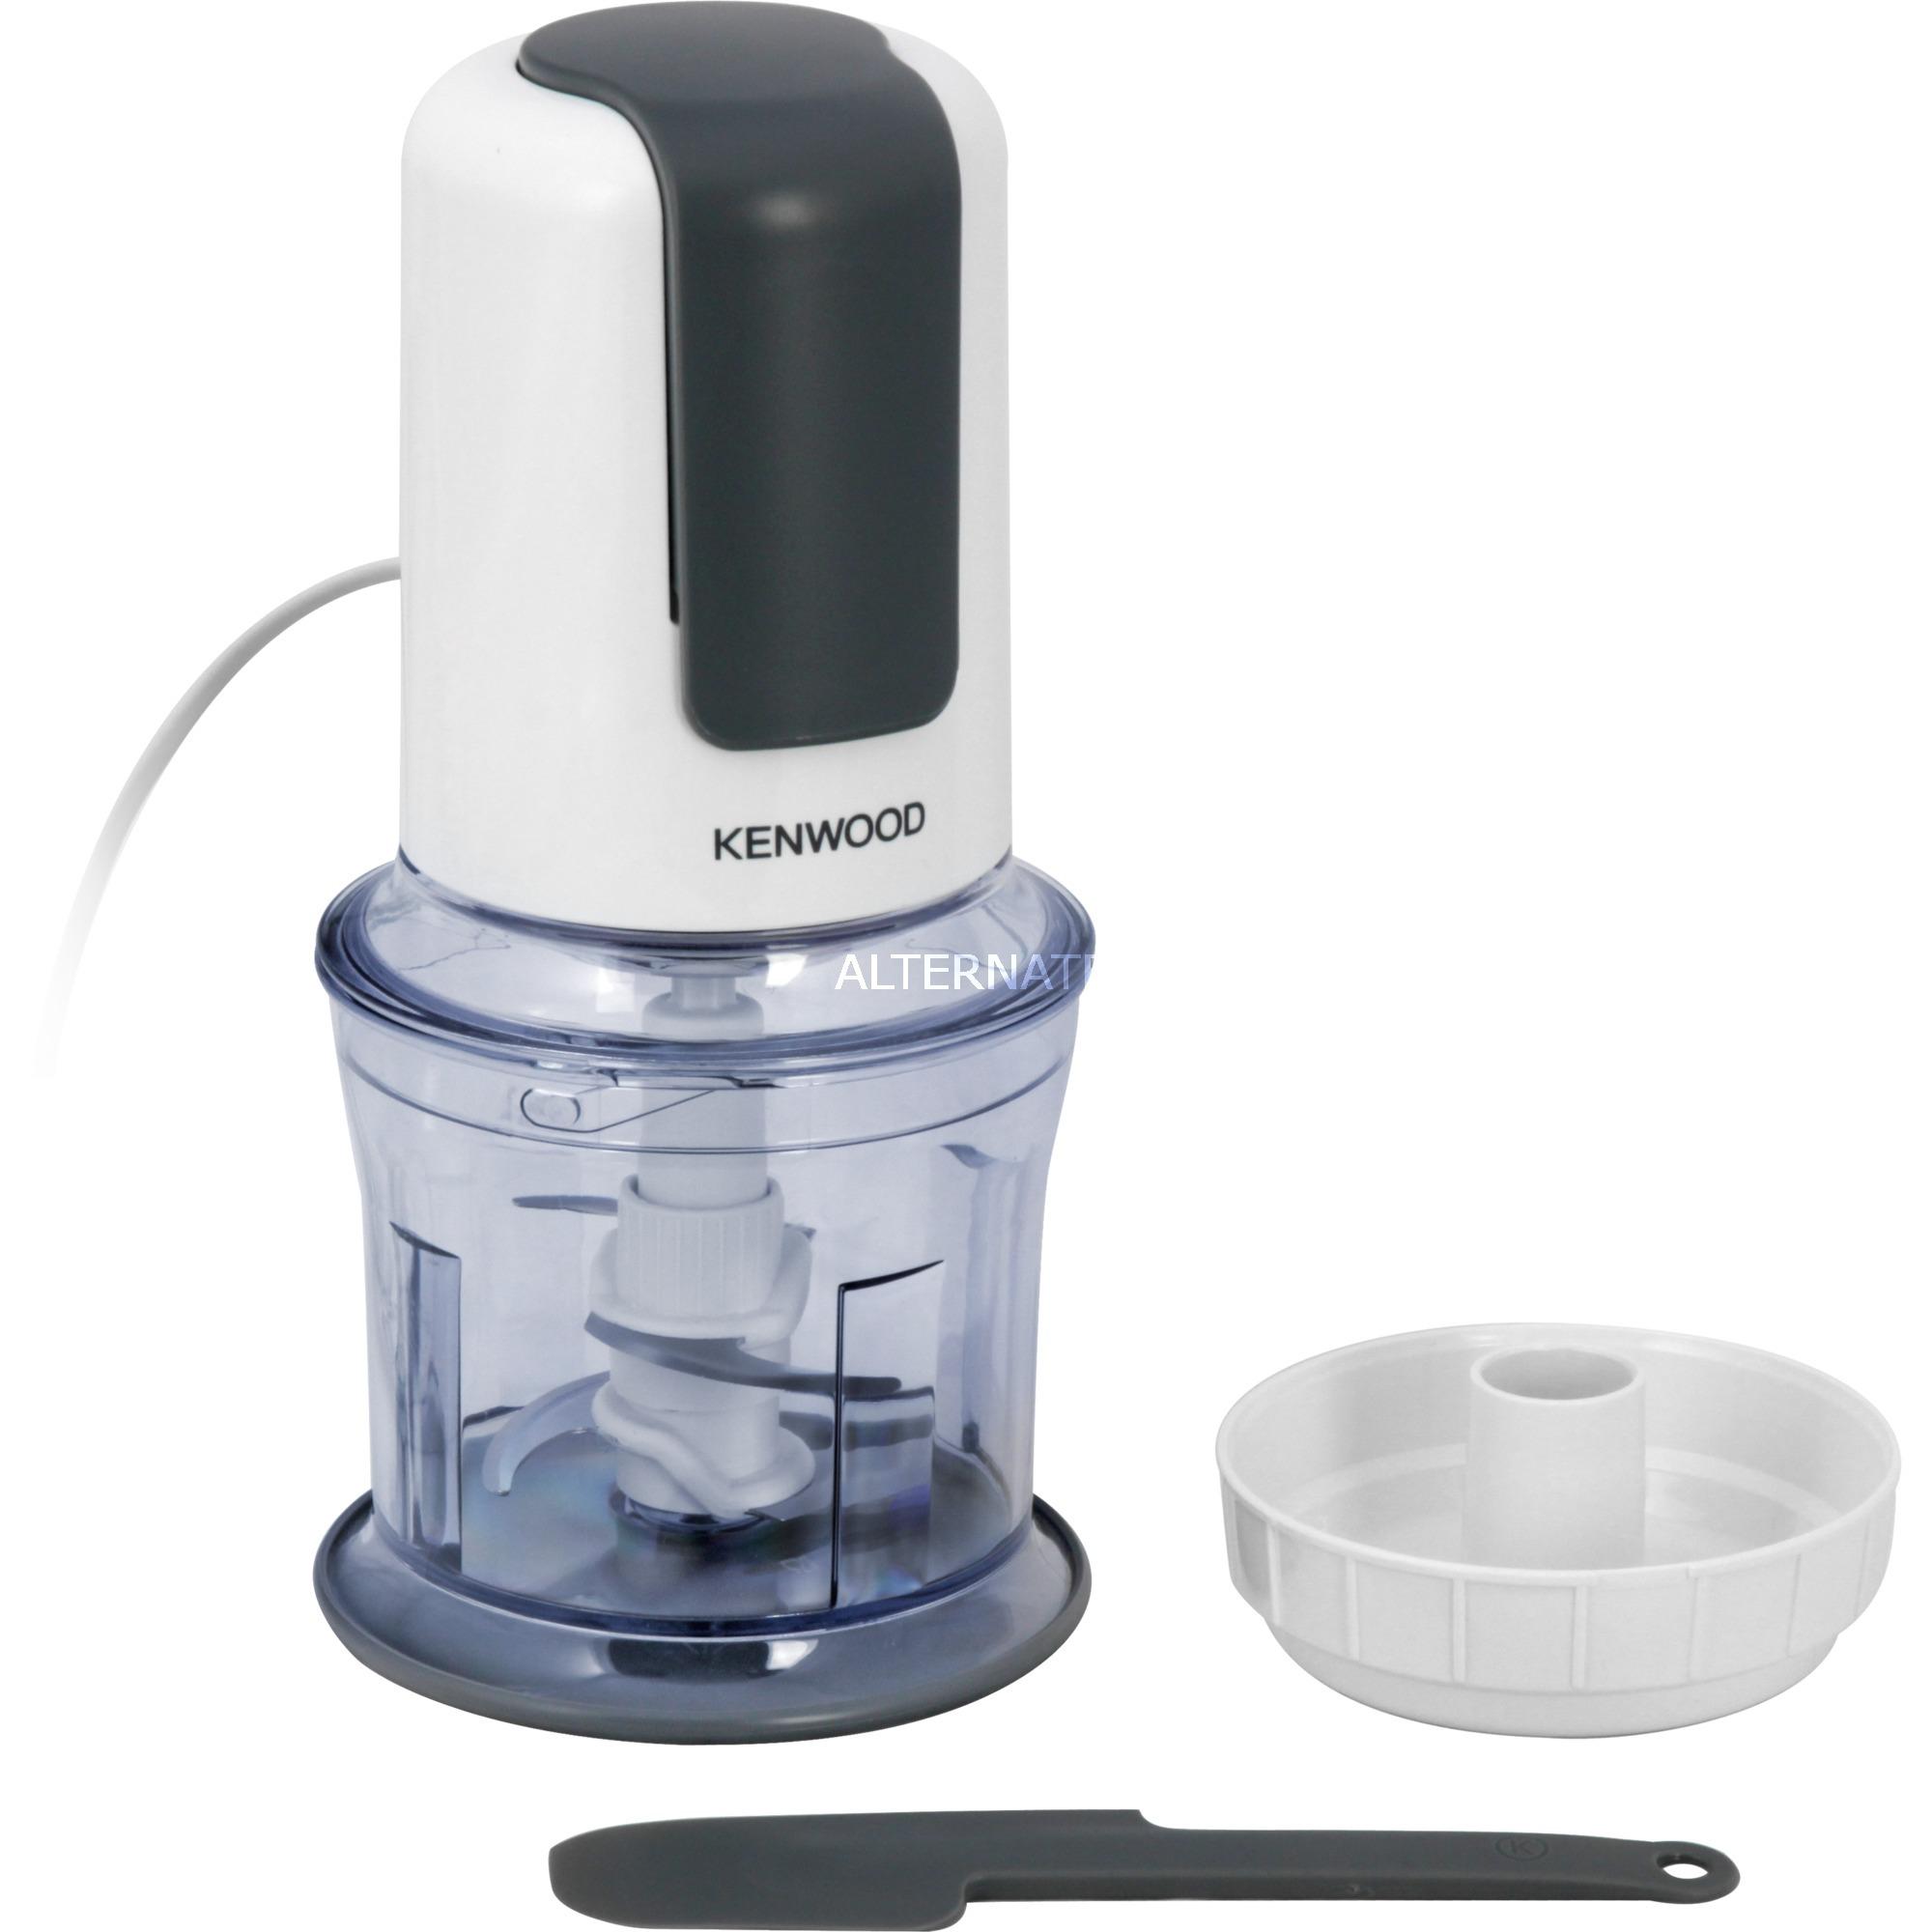 CH580 picadora eléctrica de alimentos 0,5 L Blanco 450 W, Trituradora